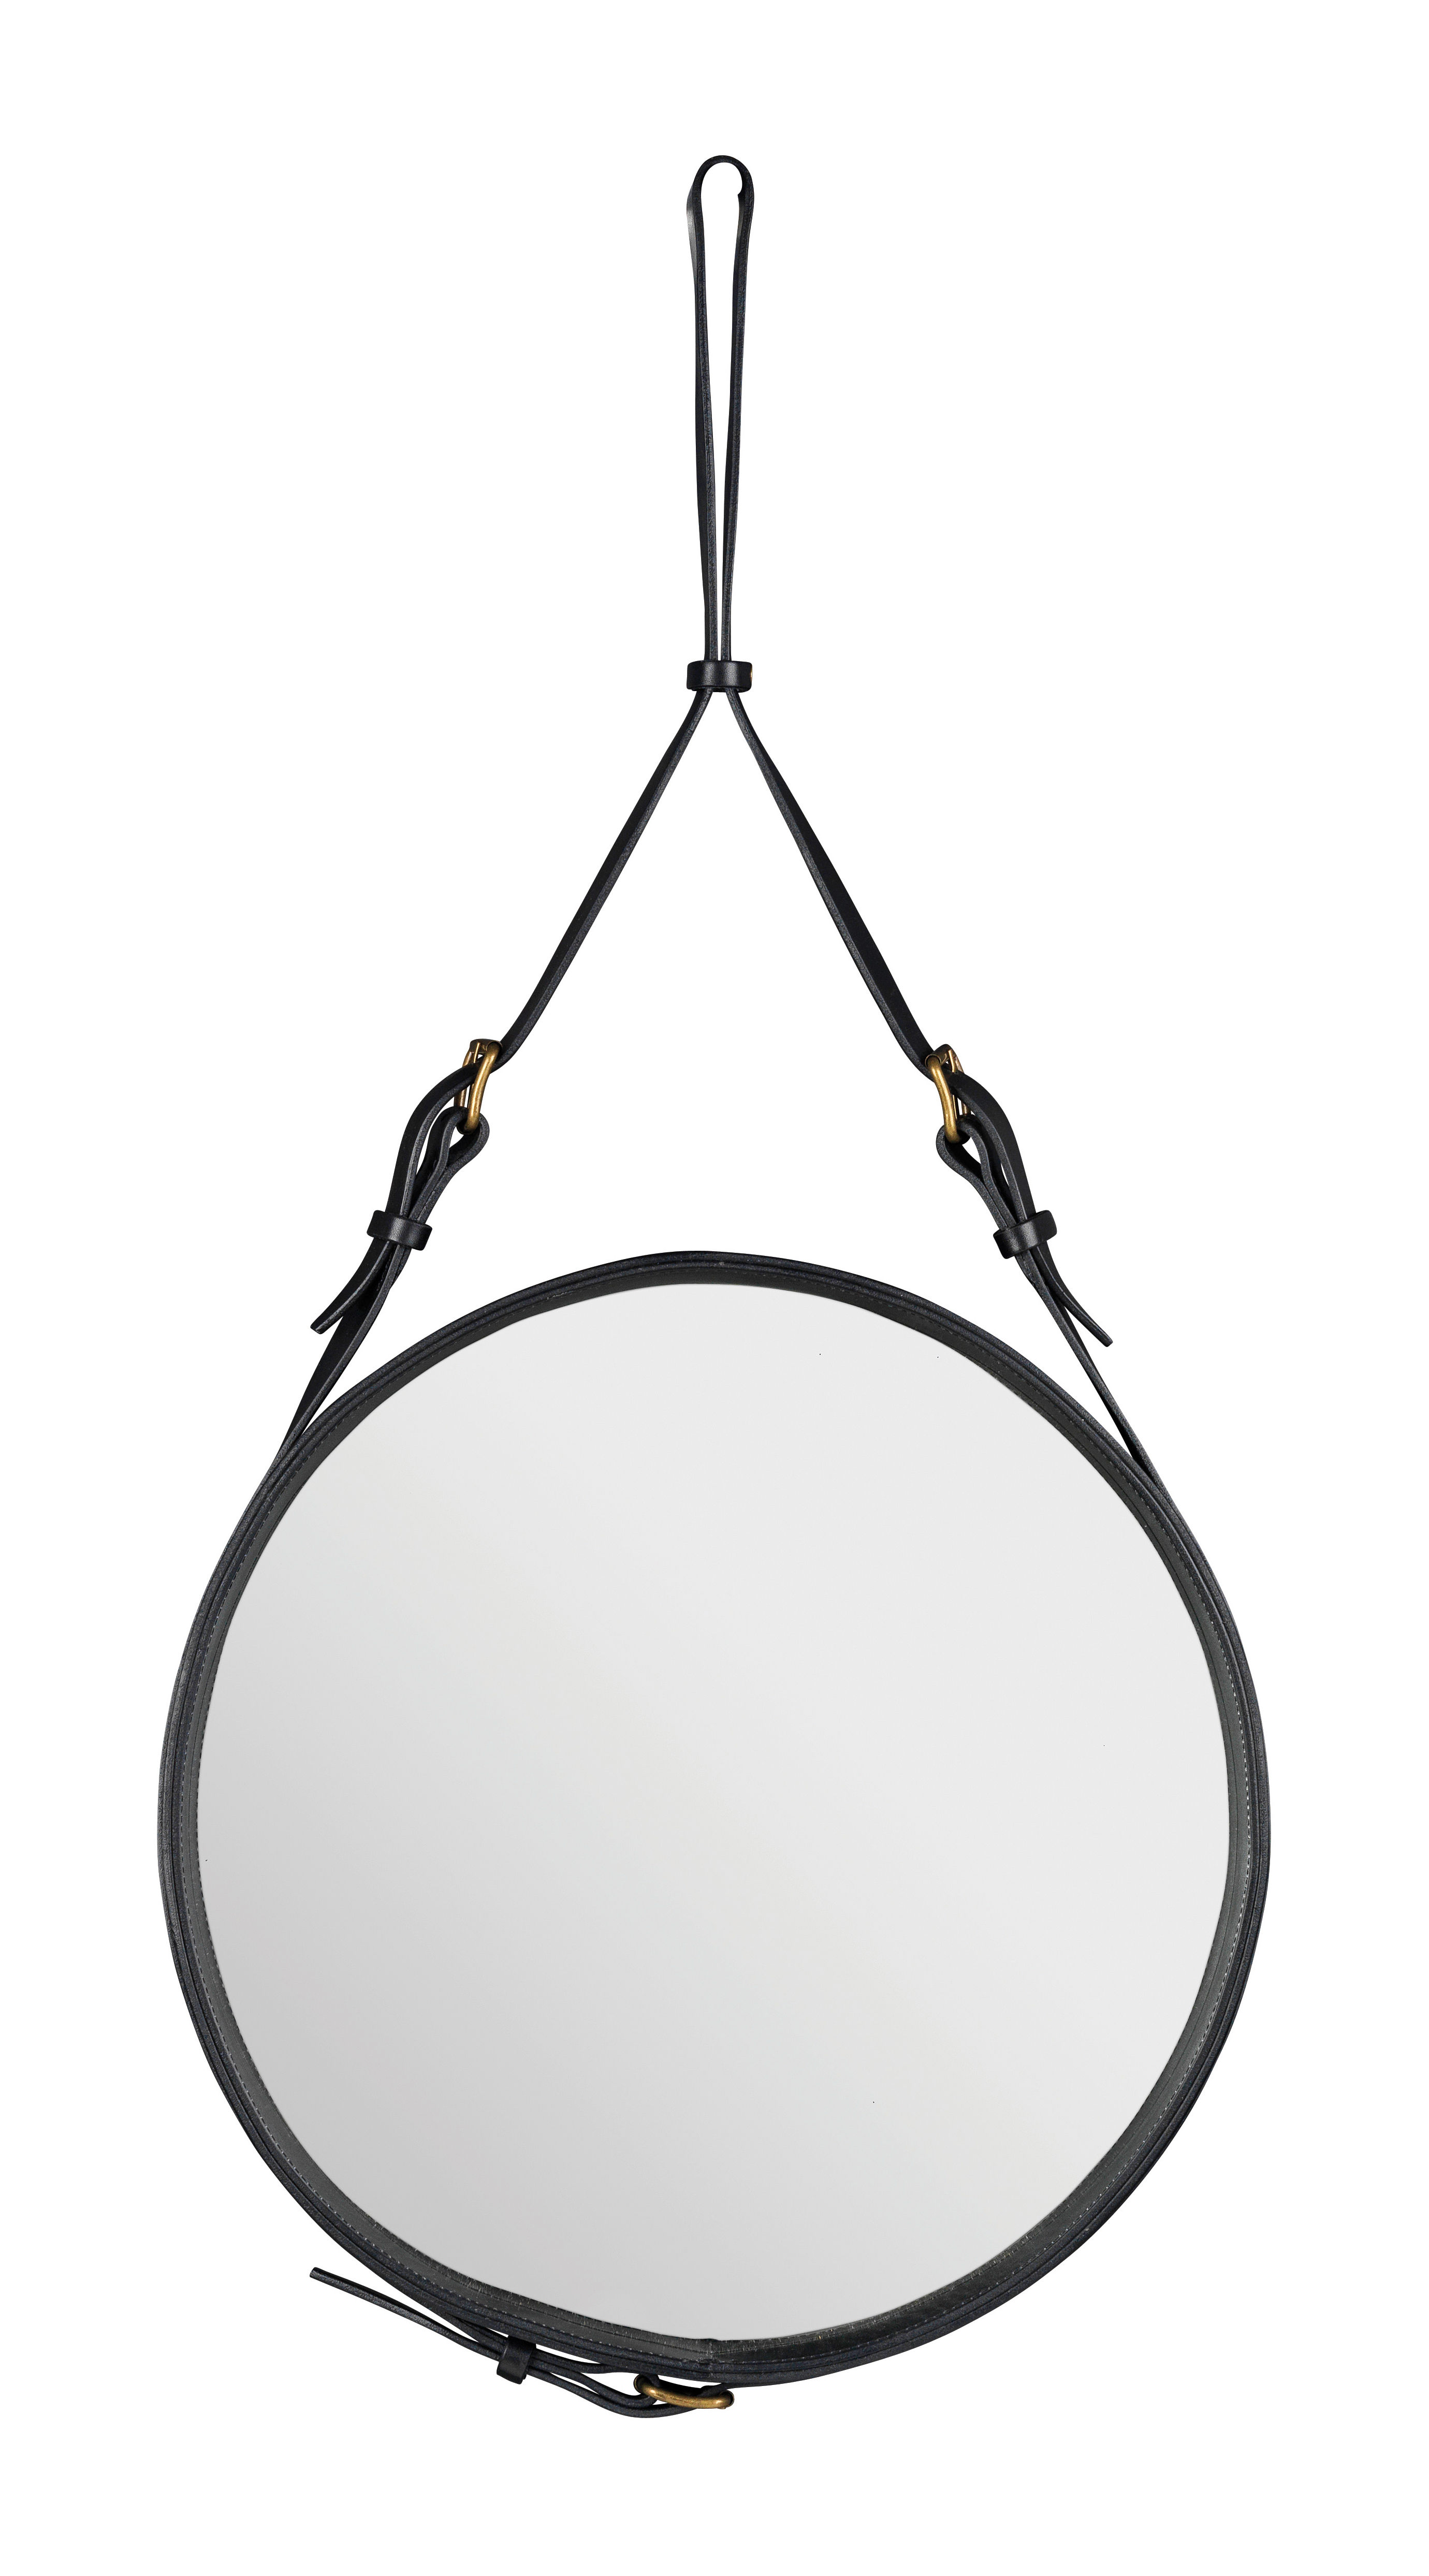 Möbel - Spiegel - Adnet Wandspiegel Ø 45 cm - Gubi - Schwarz - Leder